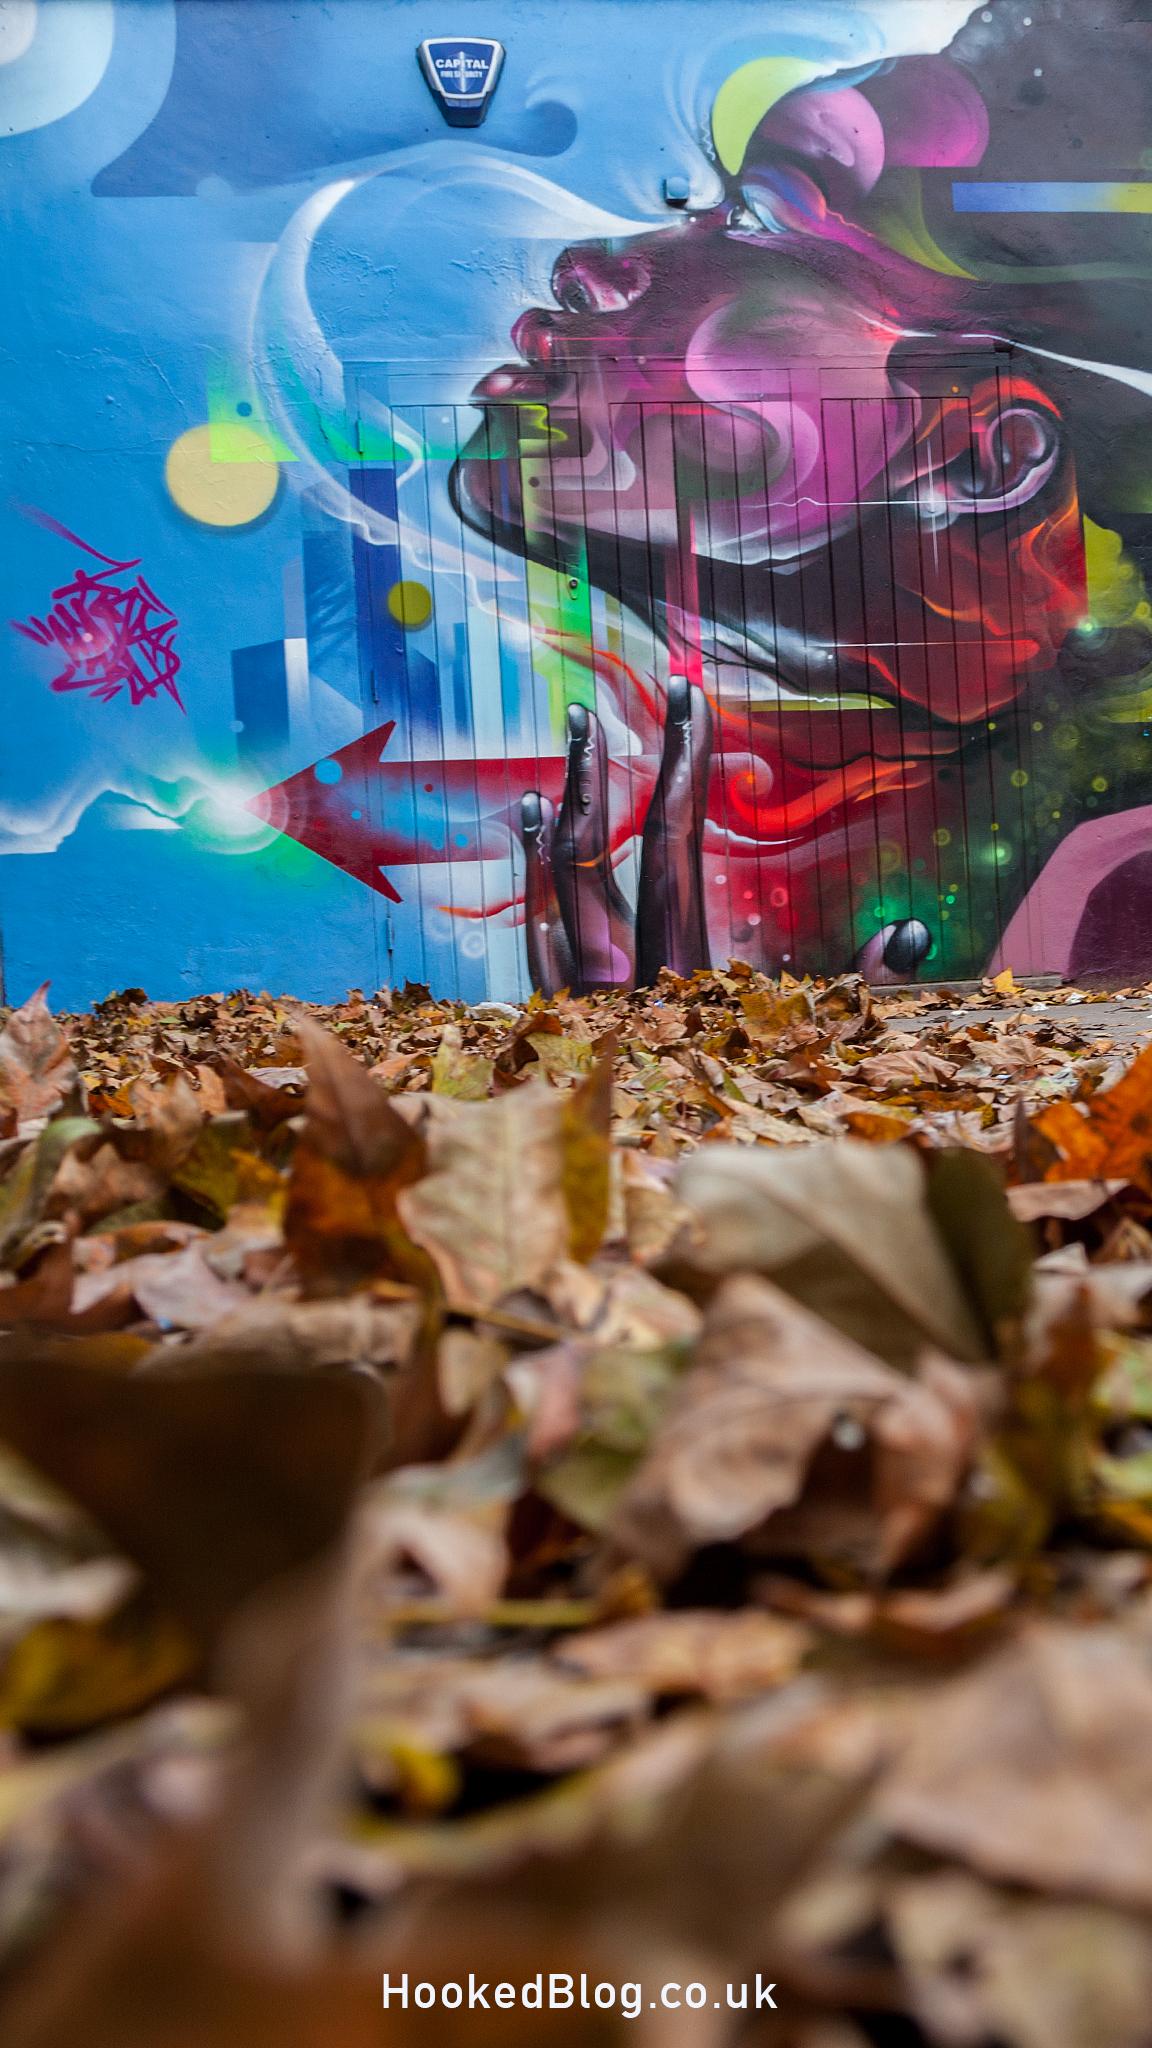 Mr Cenz - Brick Lane Street Art Mural in the Seven Star Yard